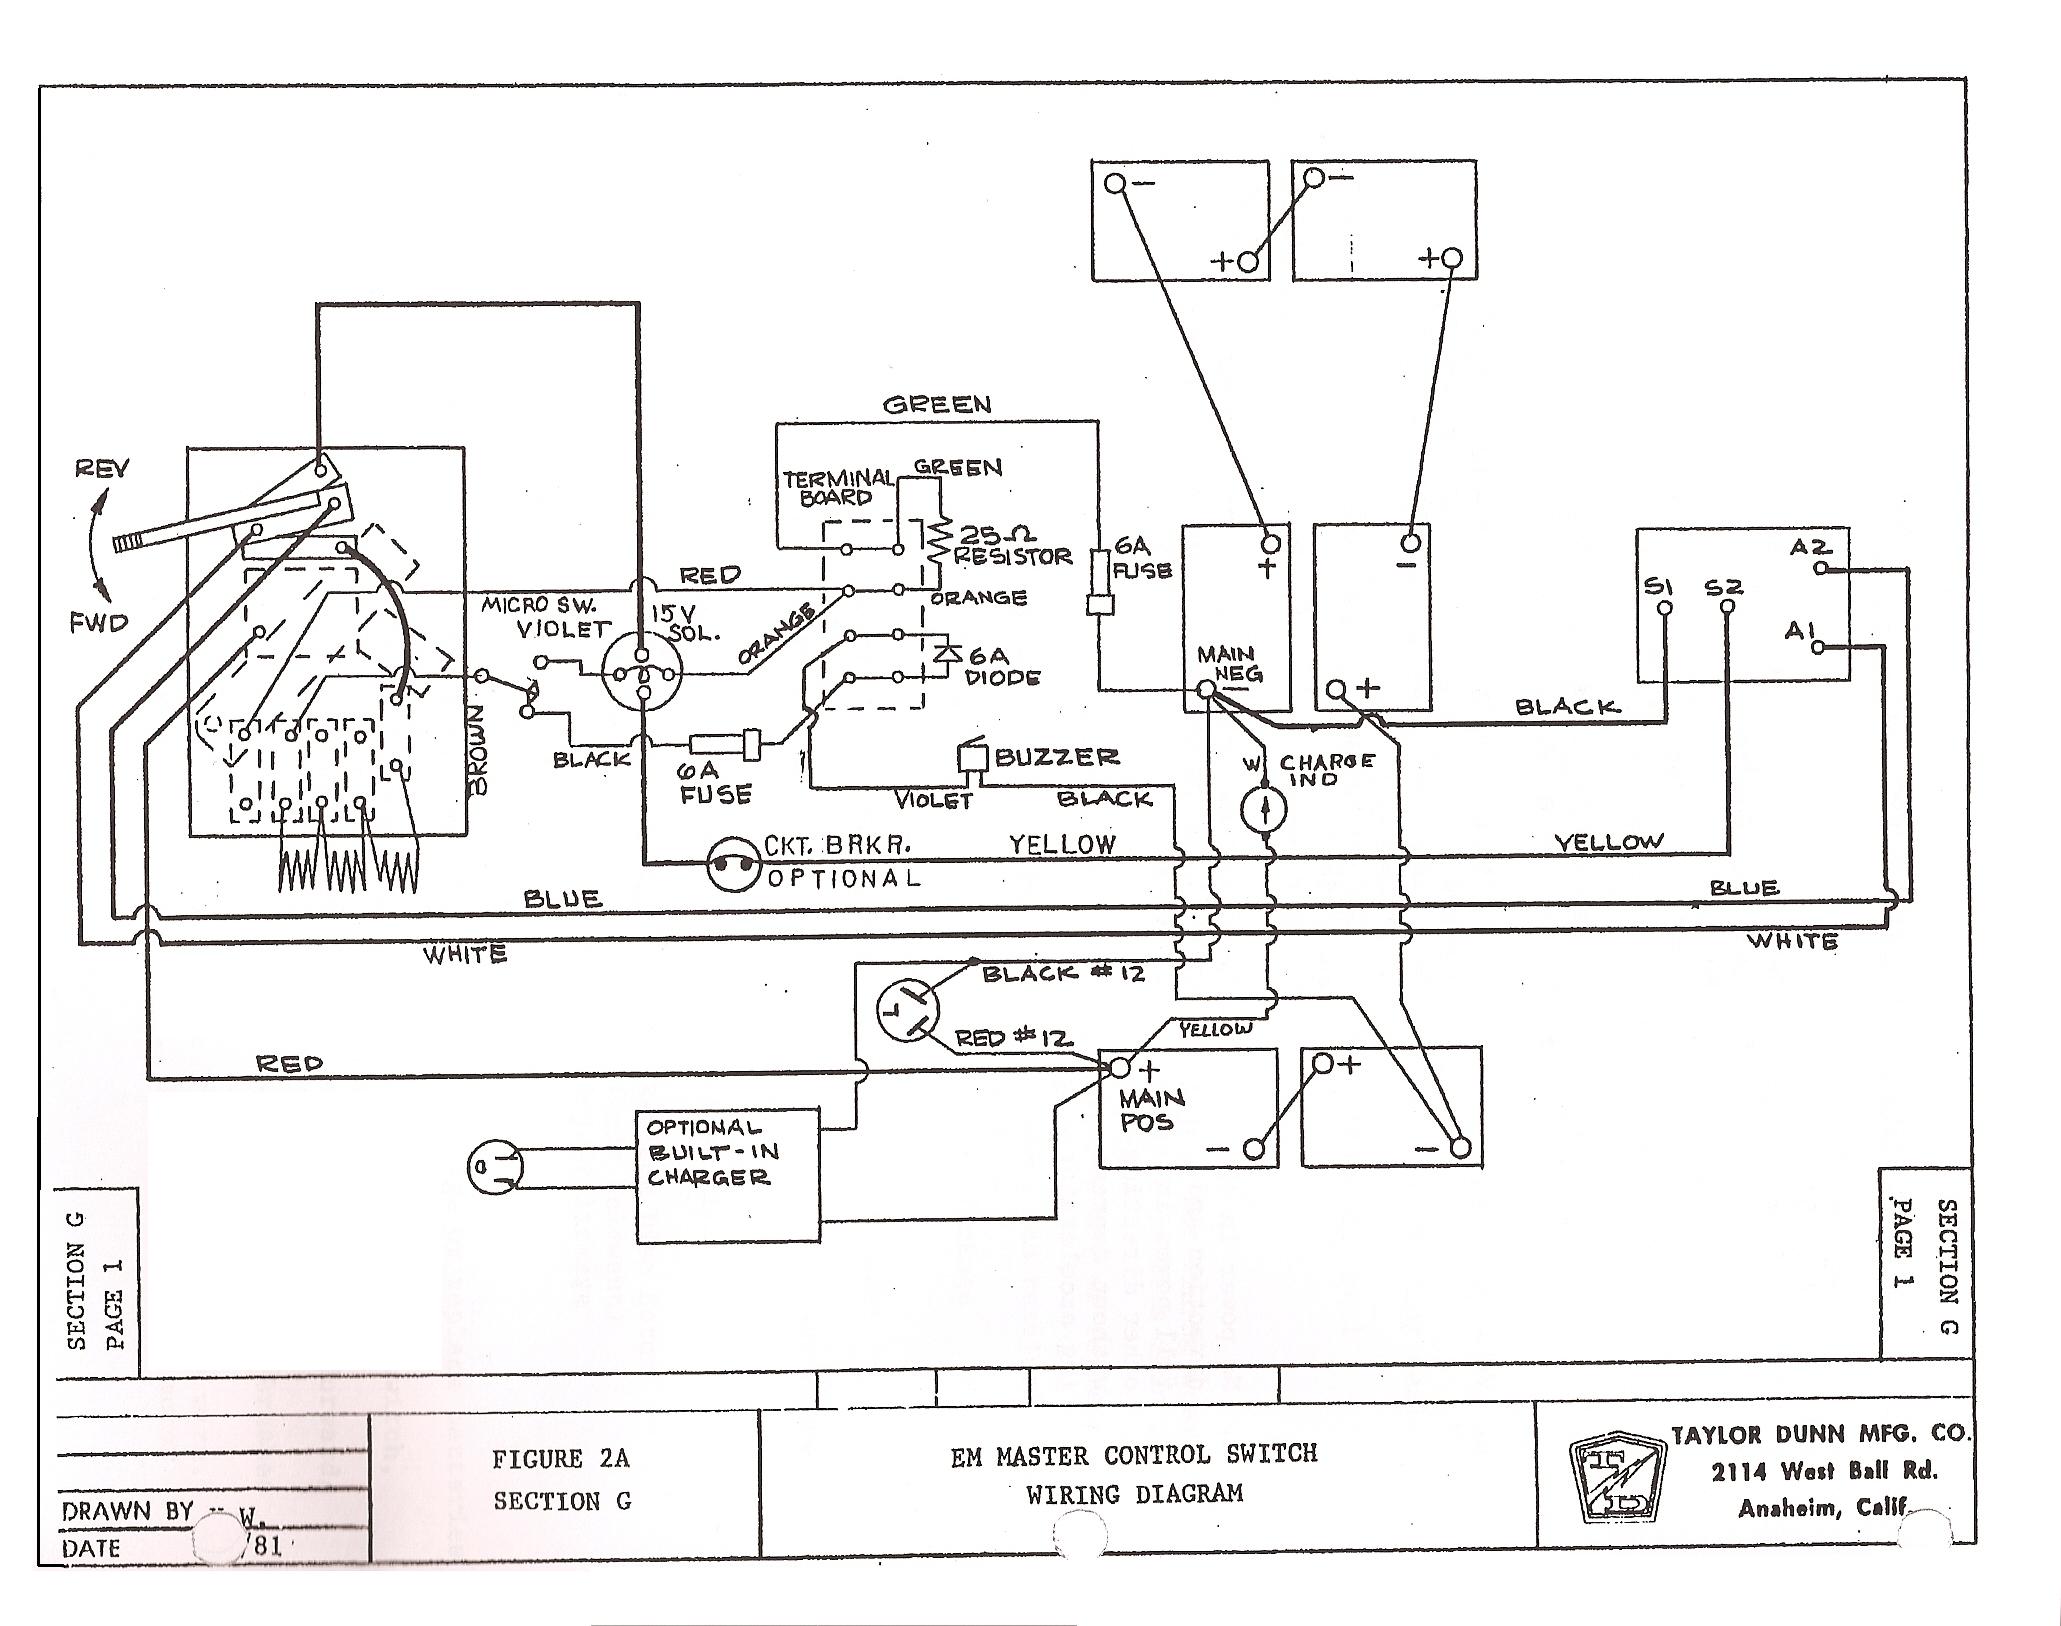 ml_4059] 36 volt club car wiring diagram golf cart download diagram  denli sple rosz argu joni viewor mohammedshrine librar wiring 101